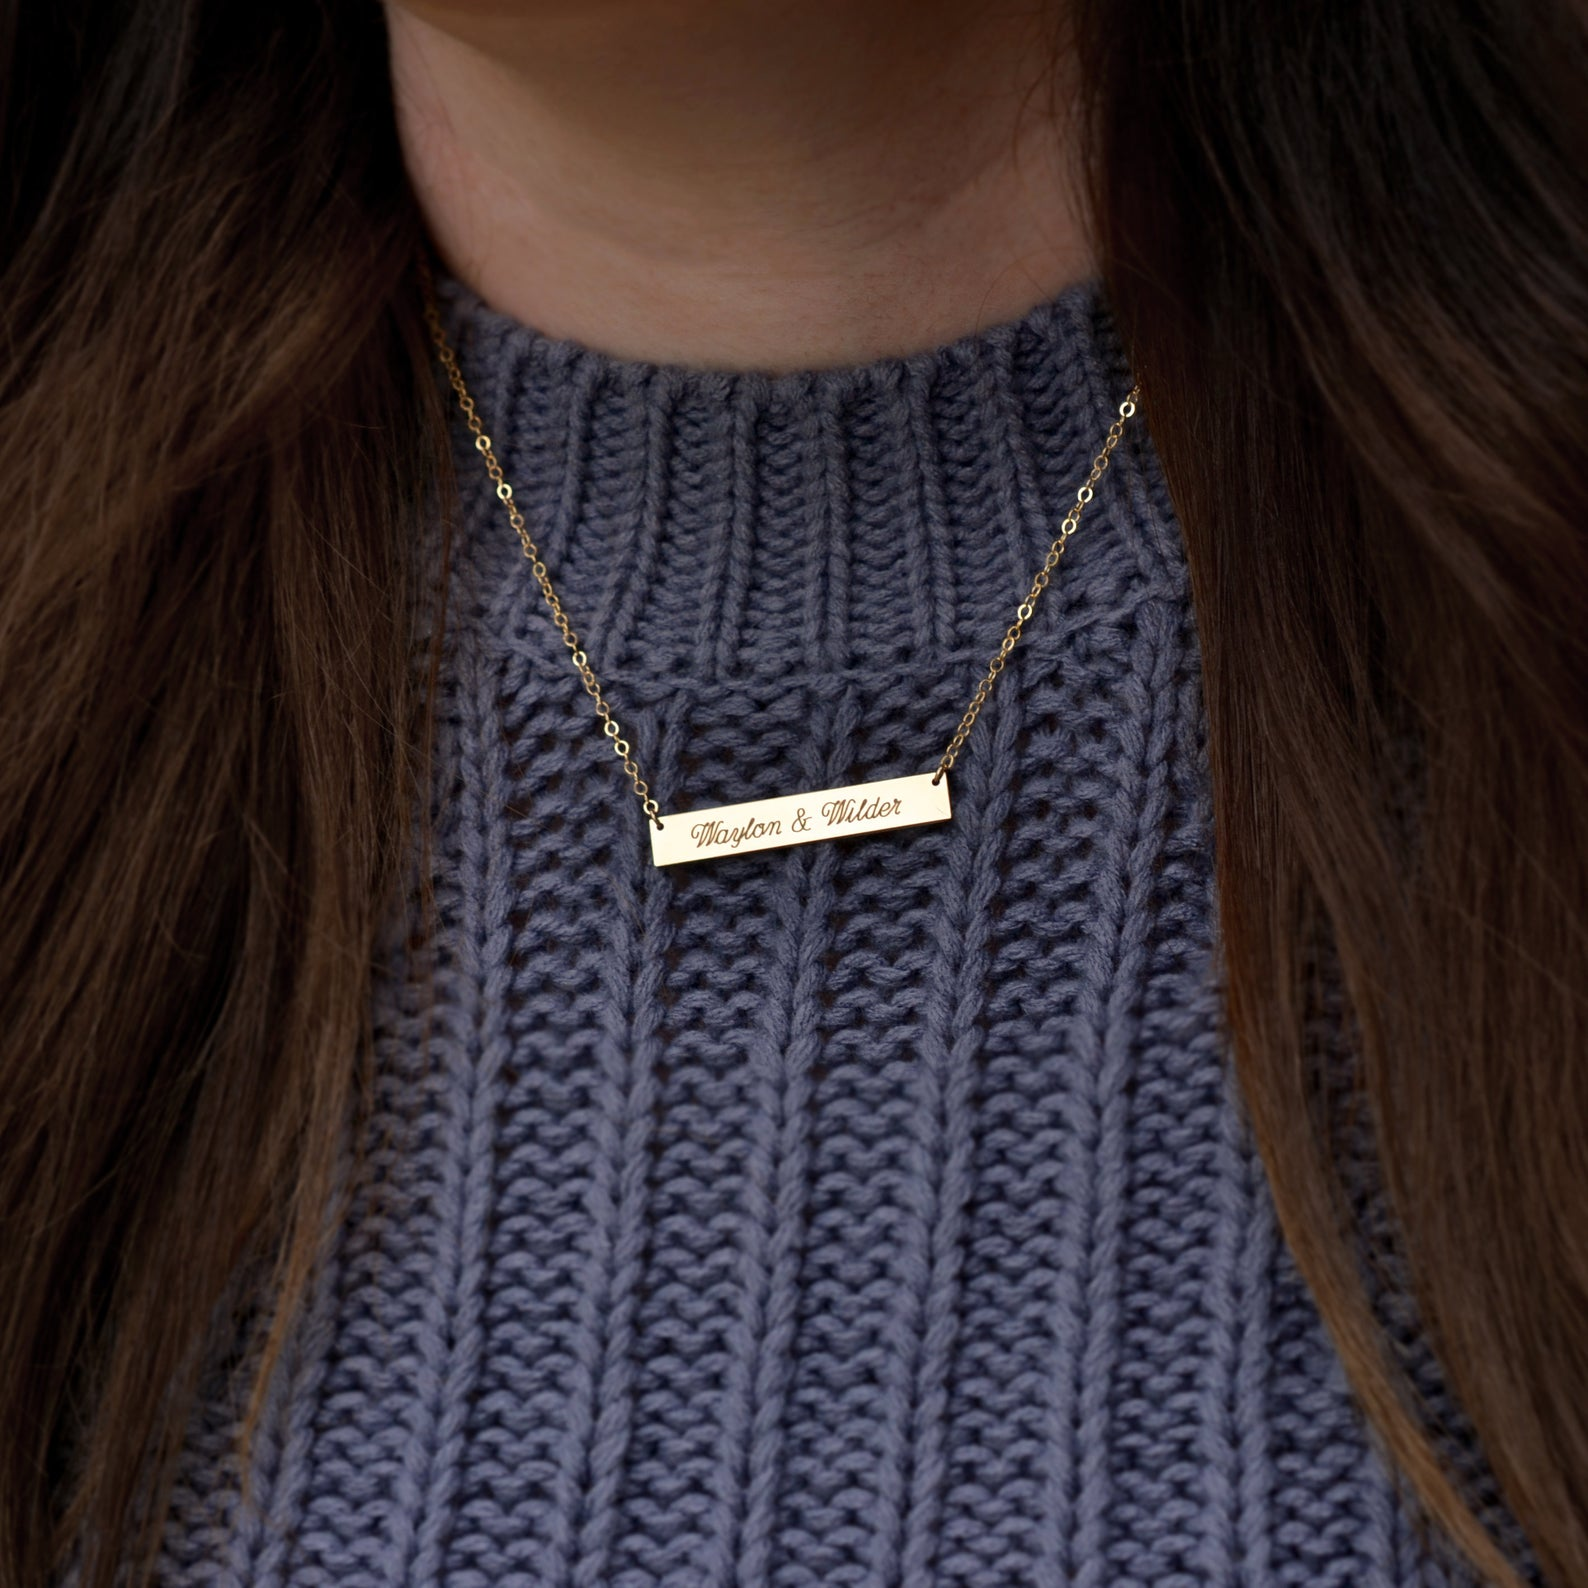 fiancée gift idea - wedding date necklace